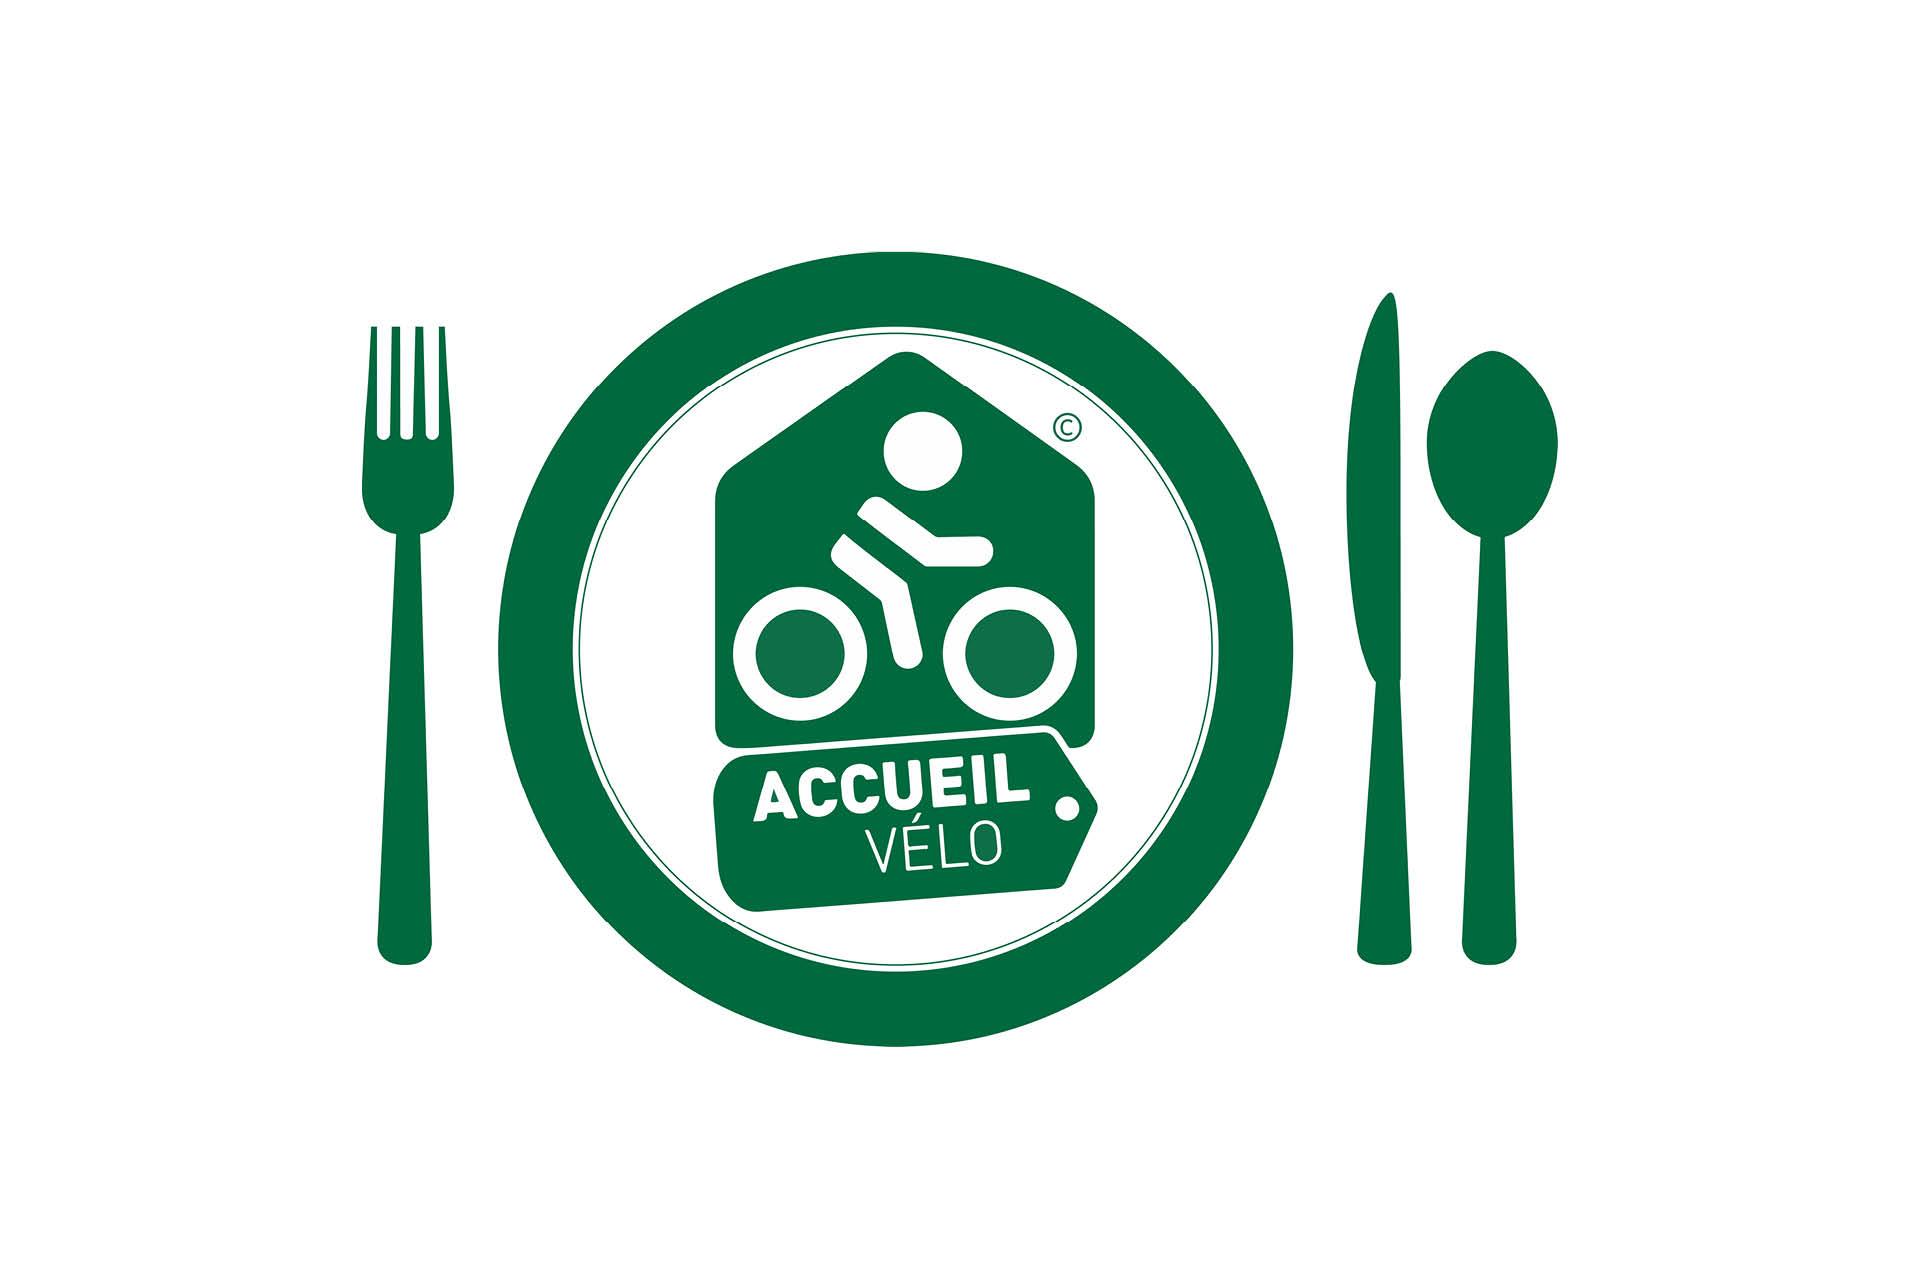 Restaurateurs ACCUEIL VELO